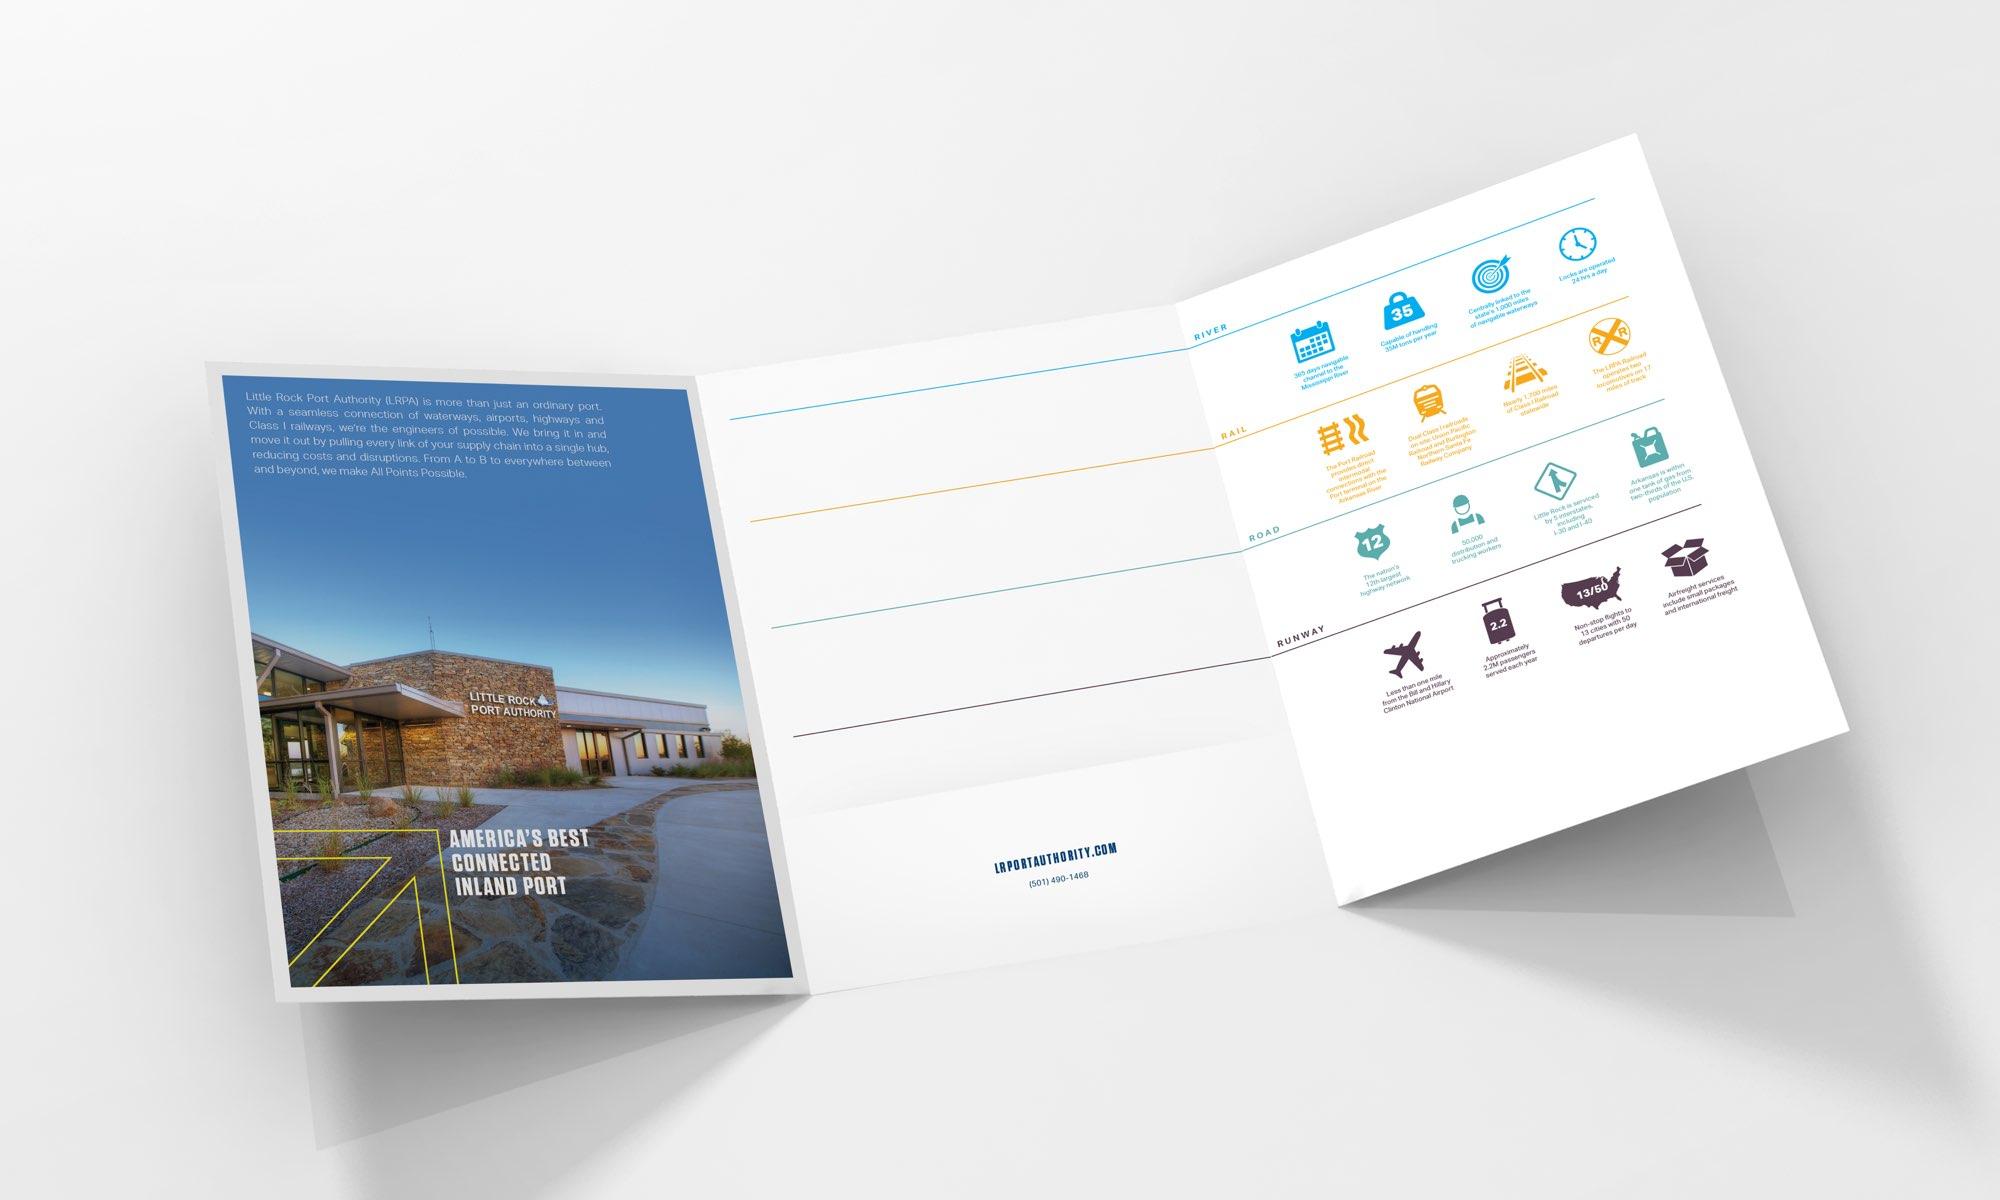 lrpa-folder-interior-opt